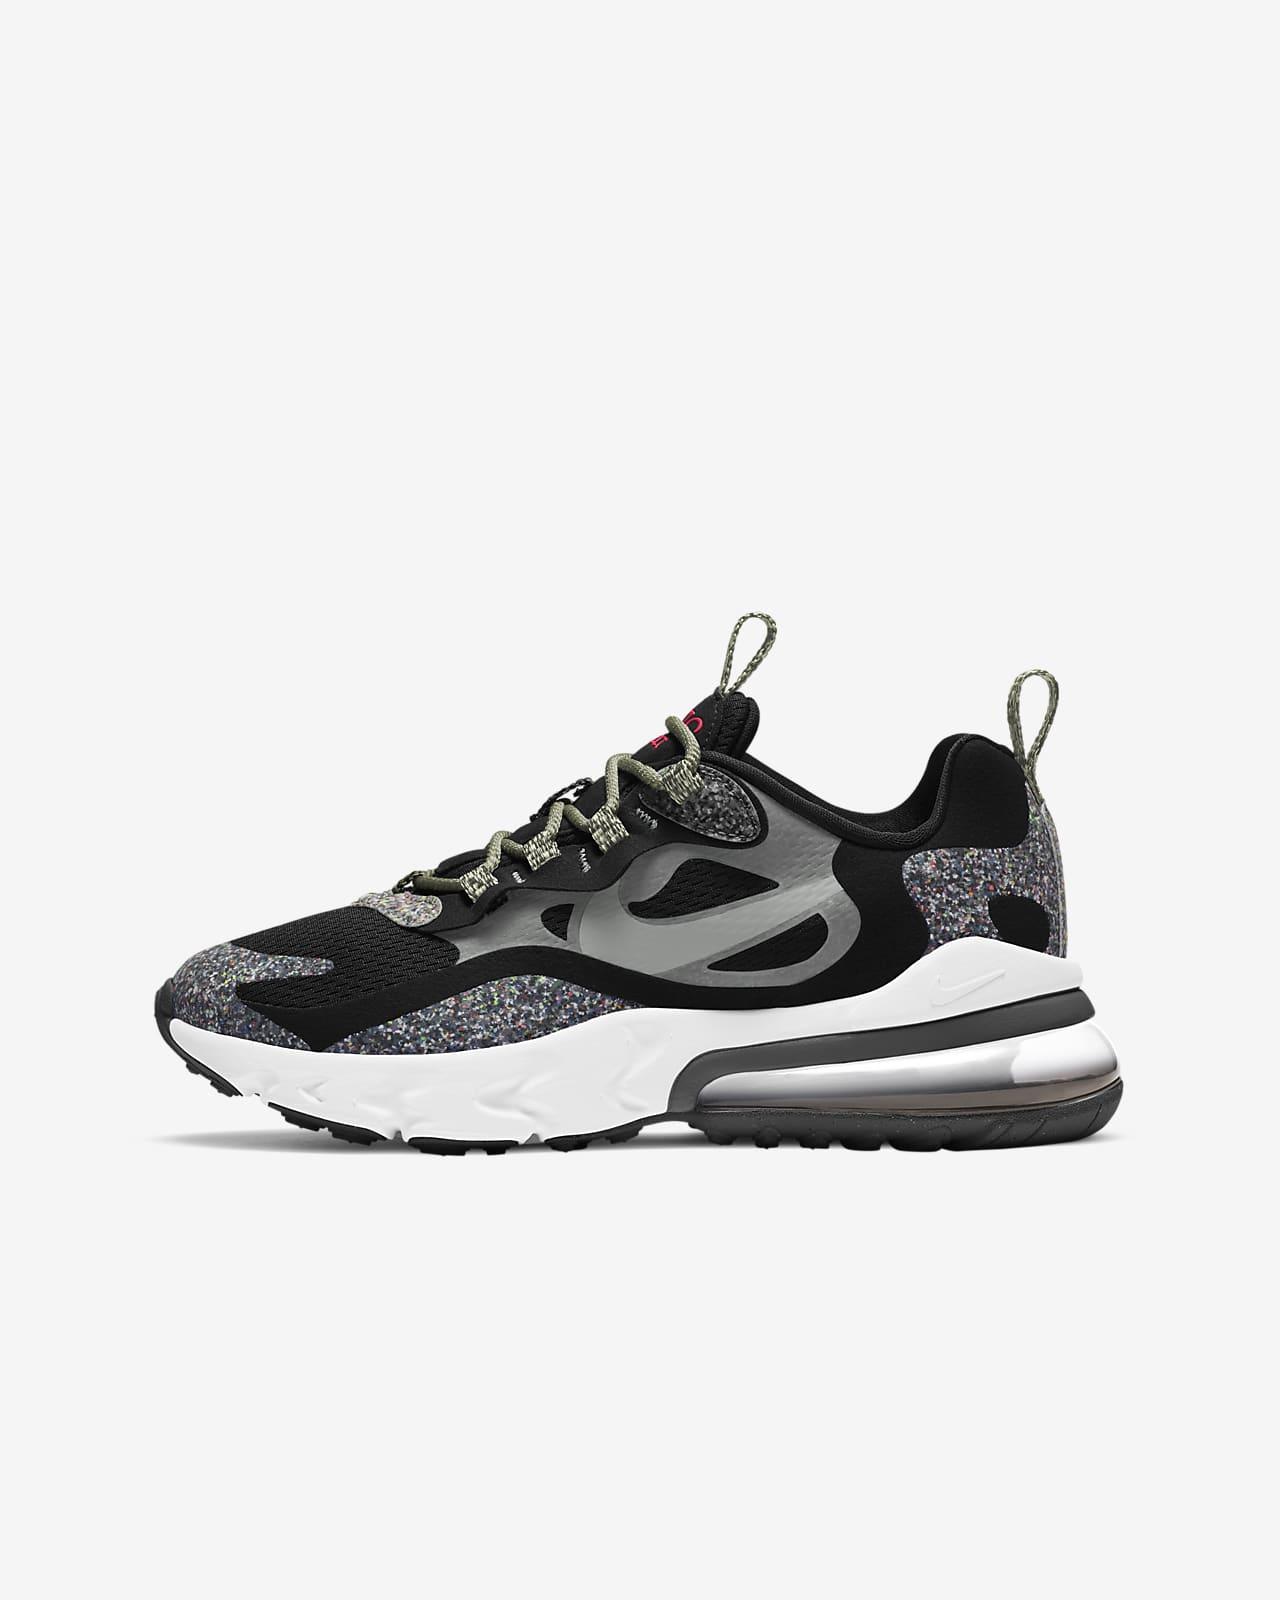 Nike Air Max 270 React SE Schuh für ältere Kinder